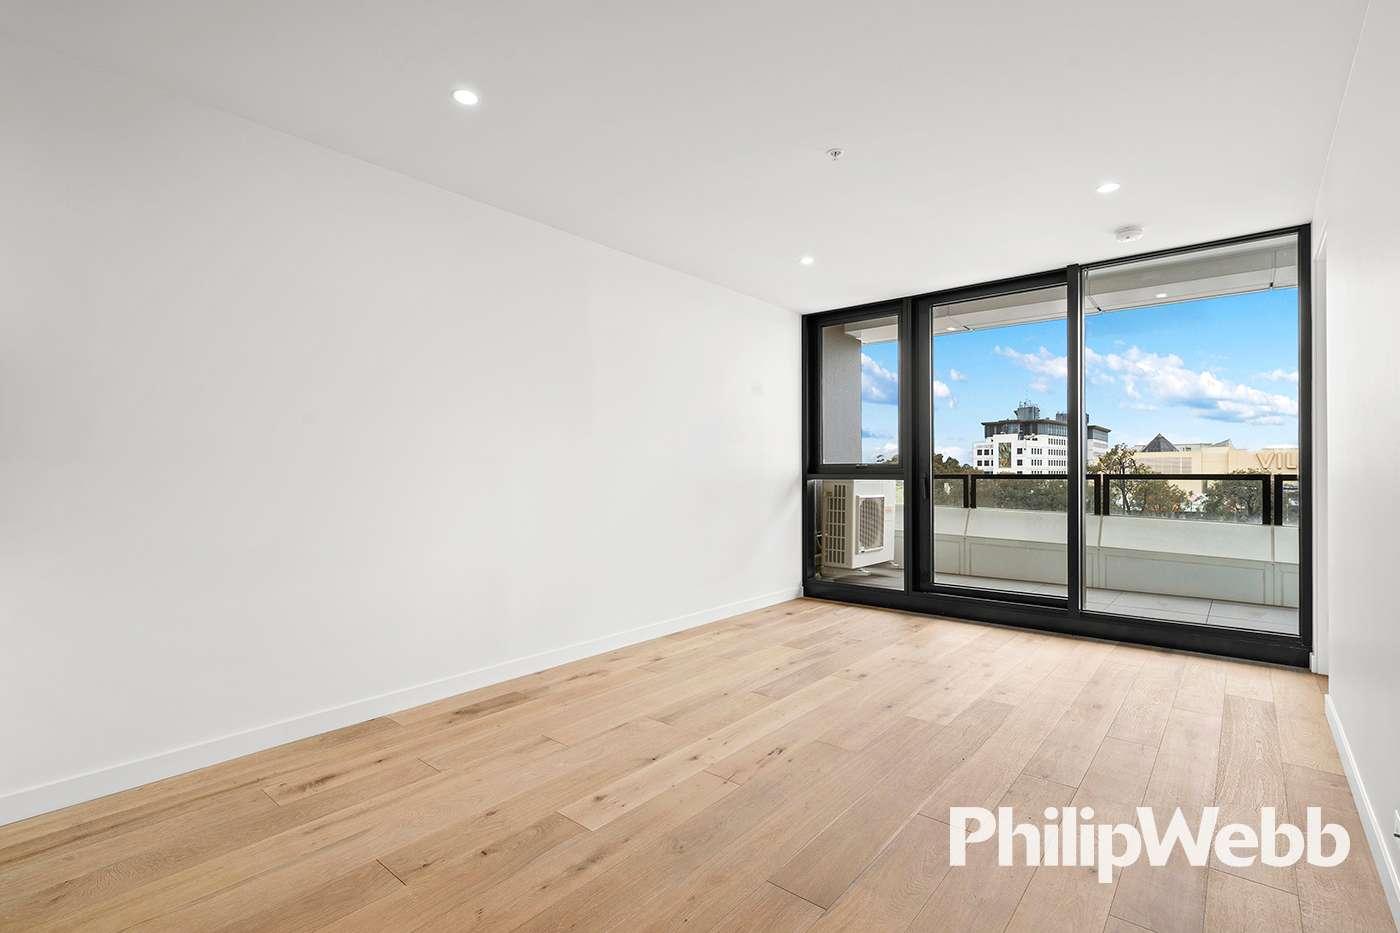 Main view of Homely apartment listing, 314/52 - 54 O Sullivan Street, Glen Waverley, VIC 3150